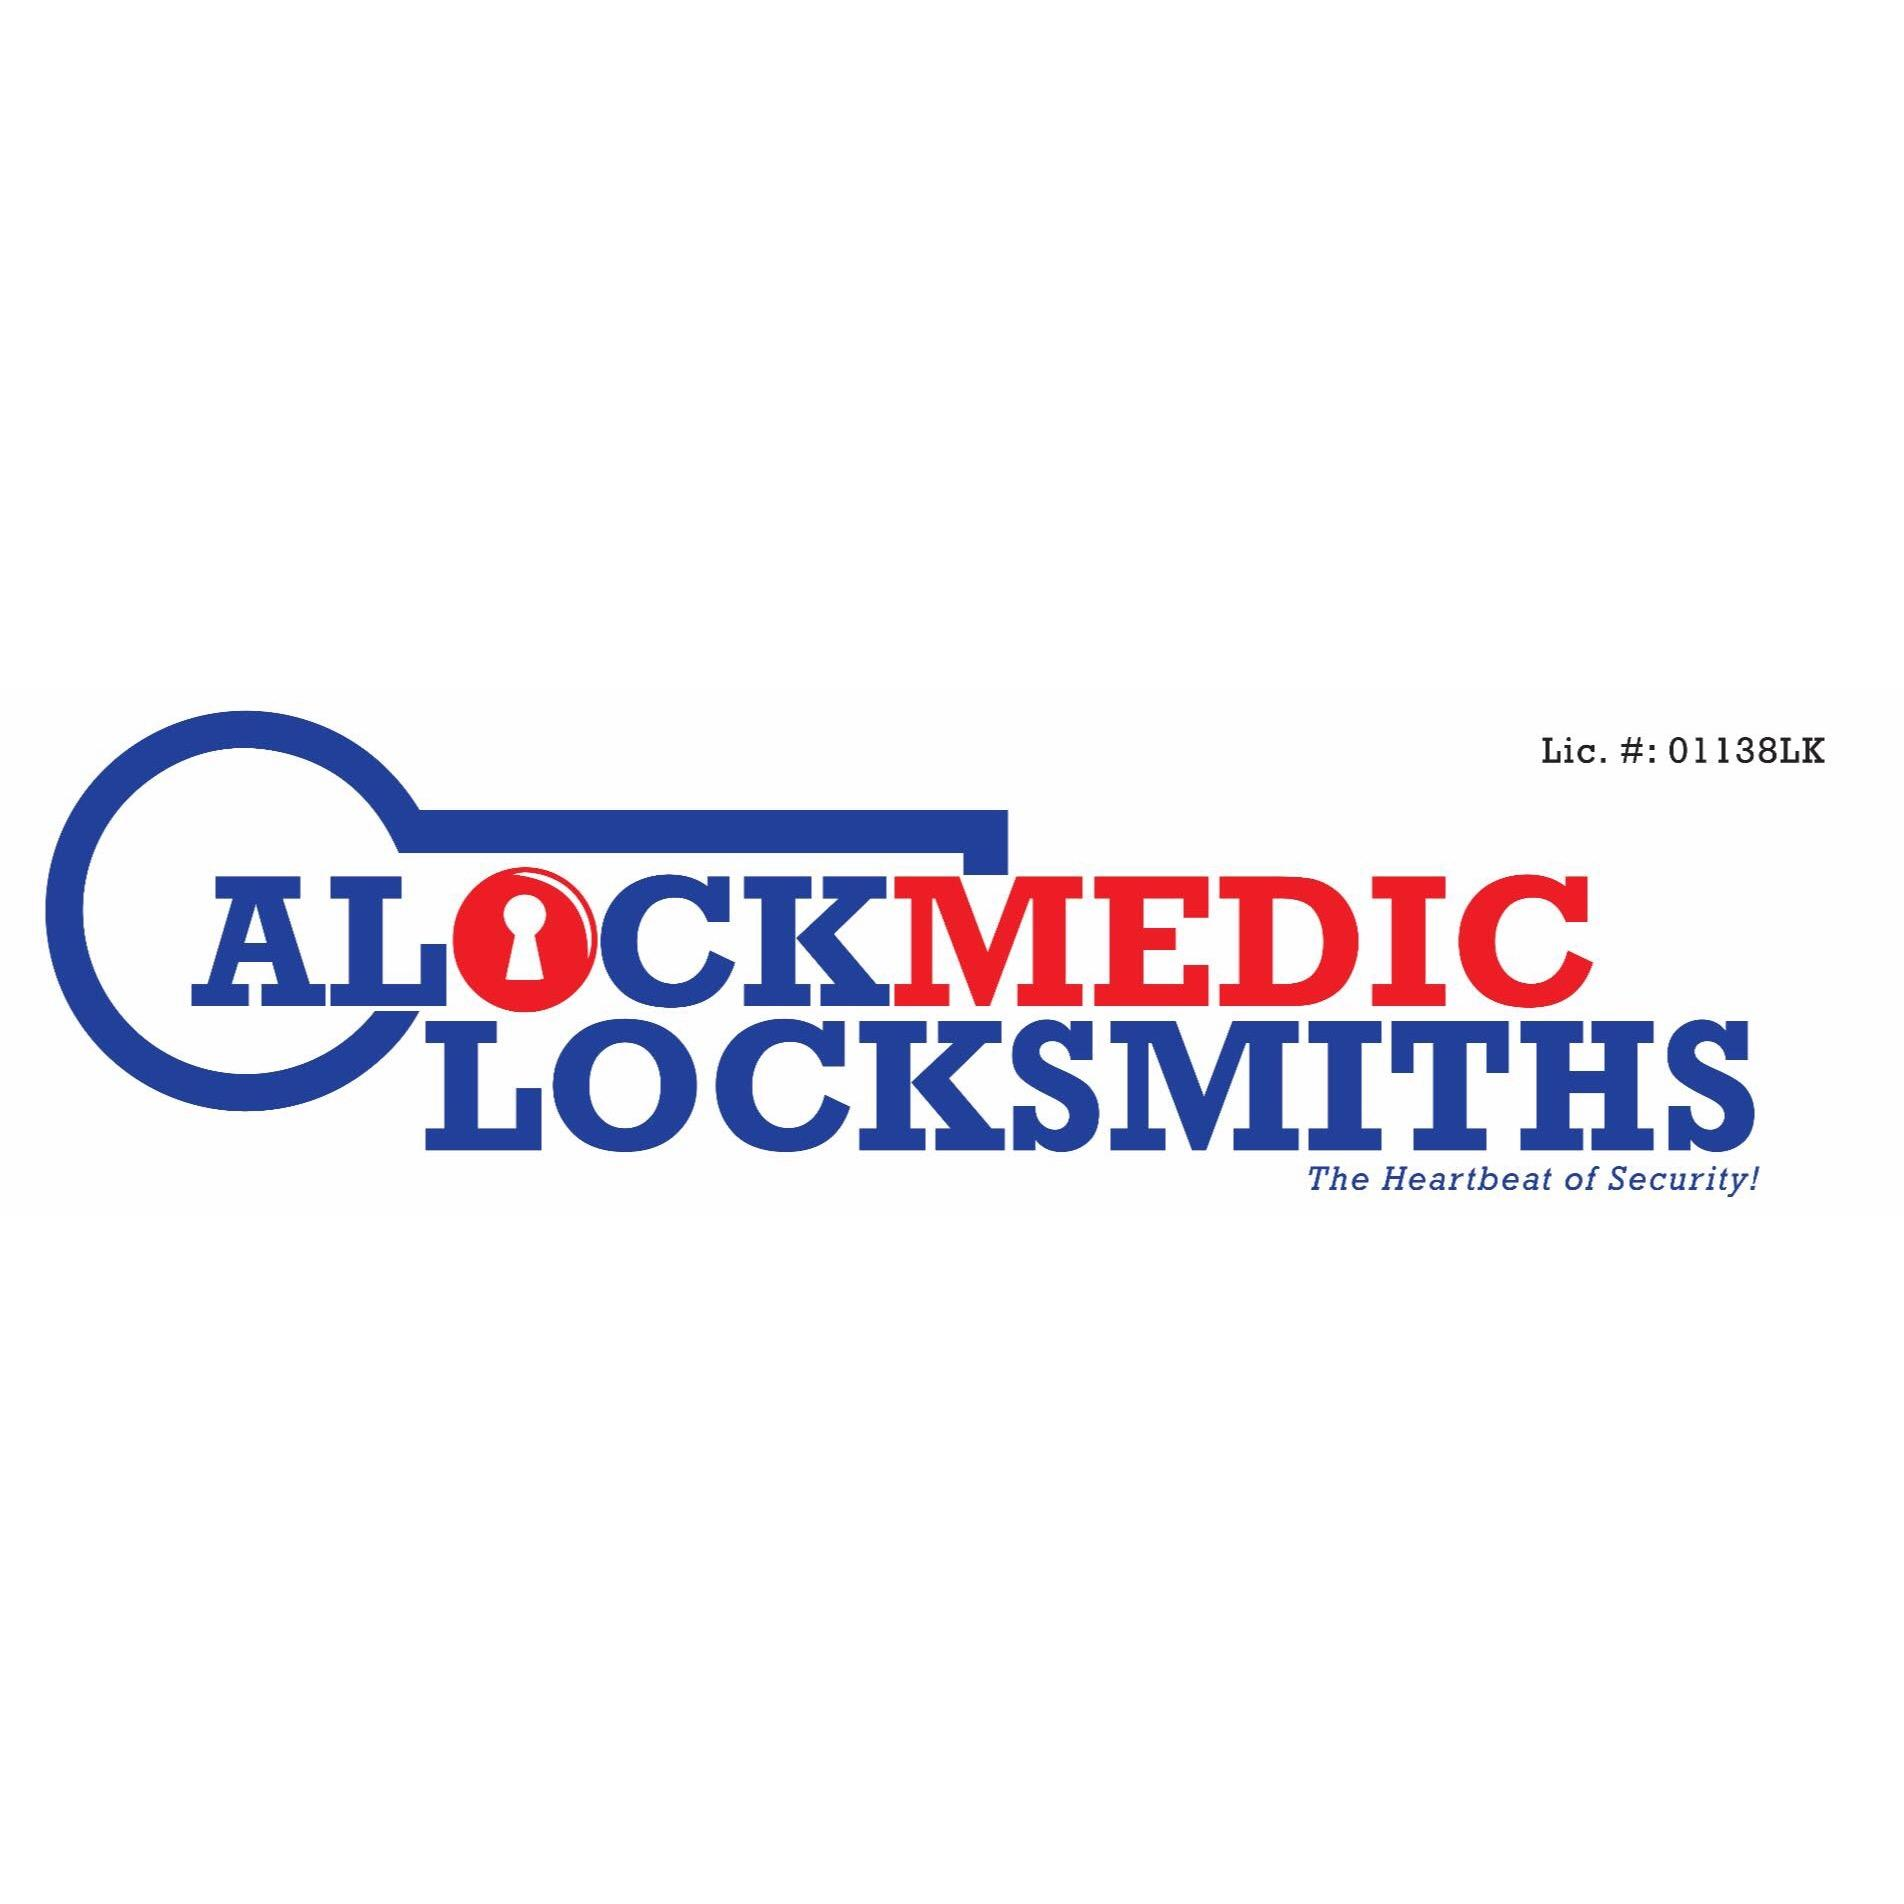 Alockmedic Locksmiths